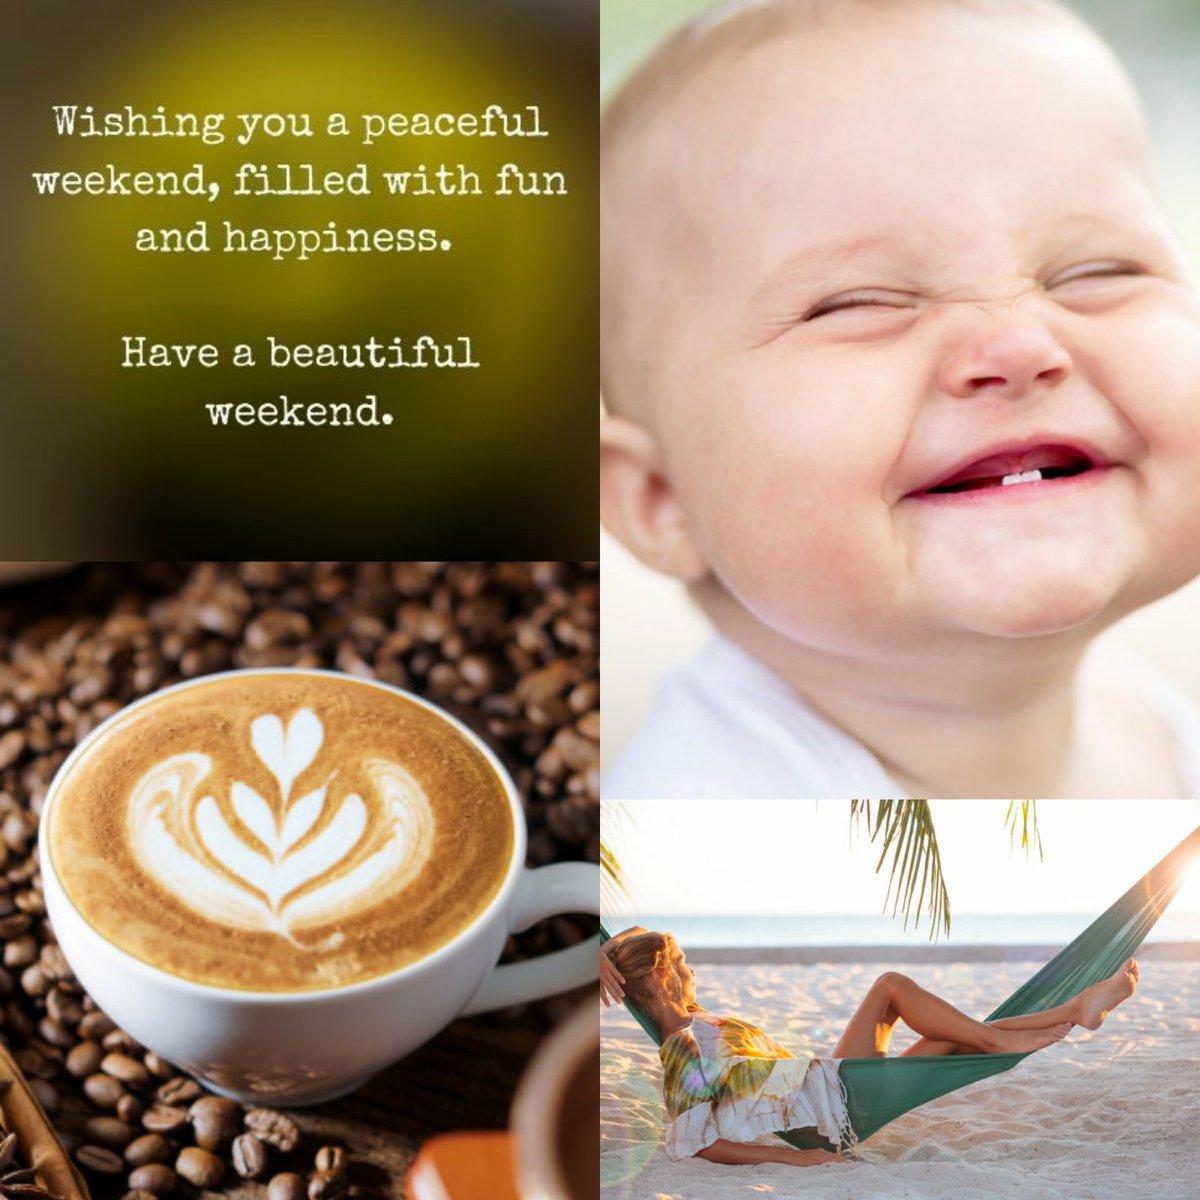 #HappyWeekend  #smile #happy  #coffee  #relaxing #WeekendMood